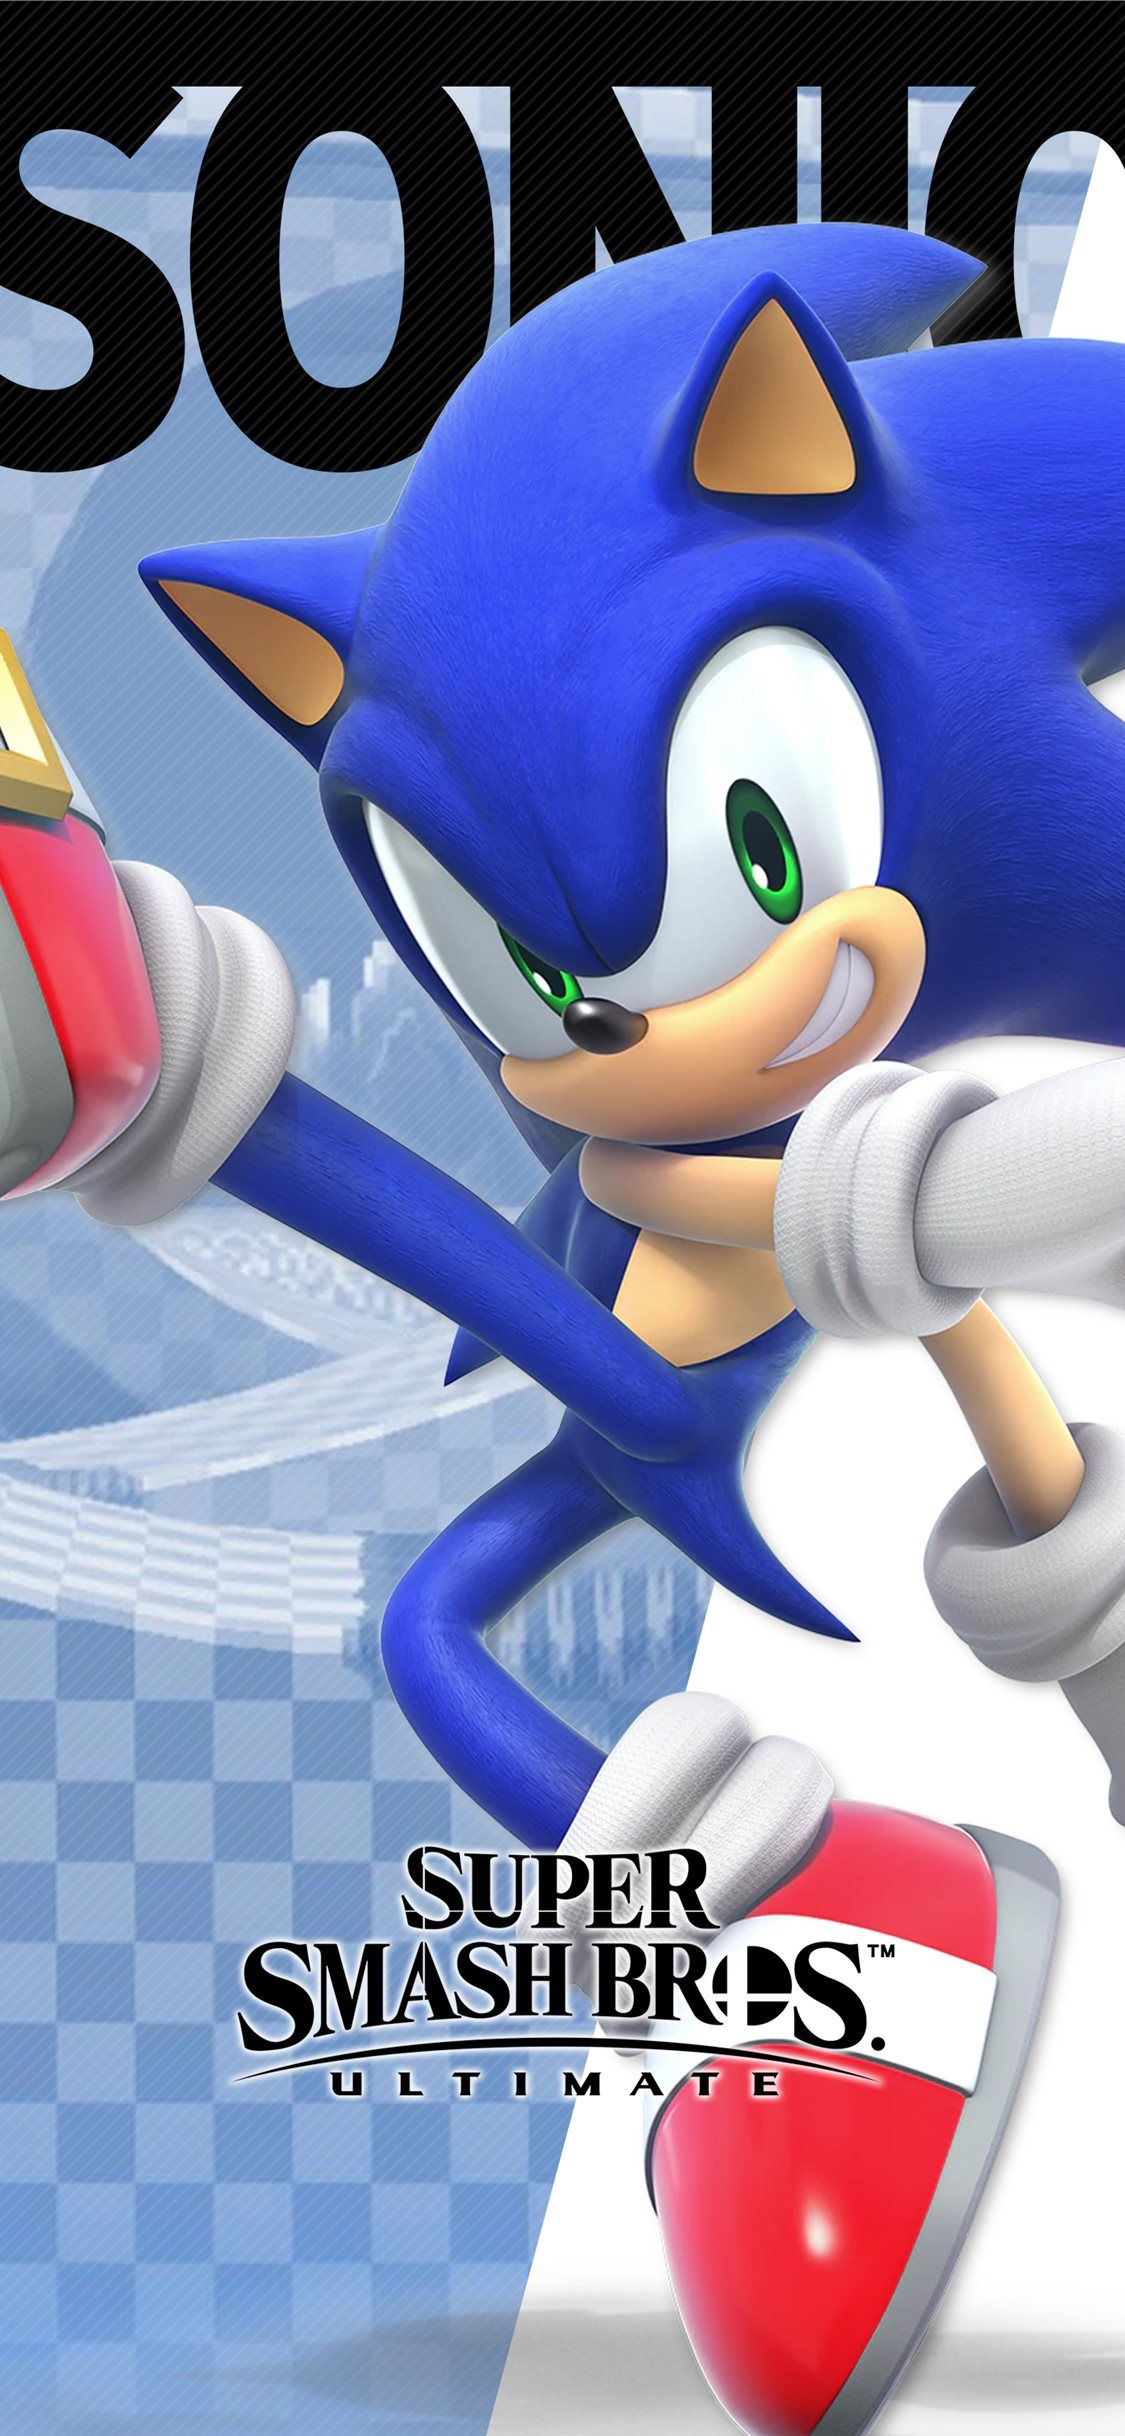 Pin By Oksa Achmad On Omggggg In 2020 Super Smash Bros Smash Bros Sonic